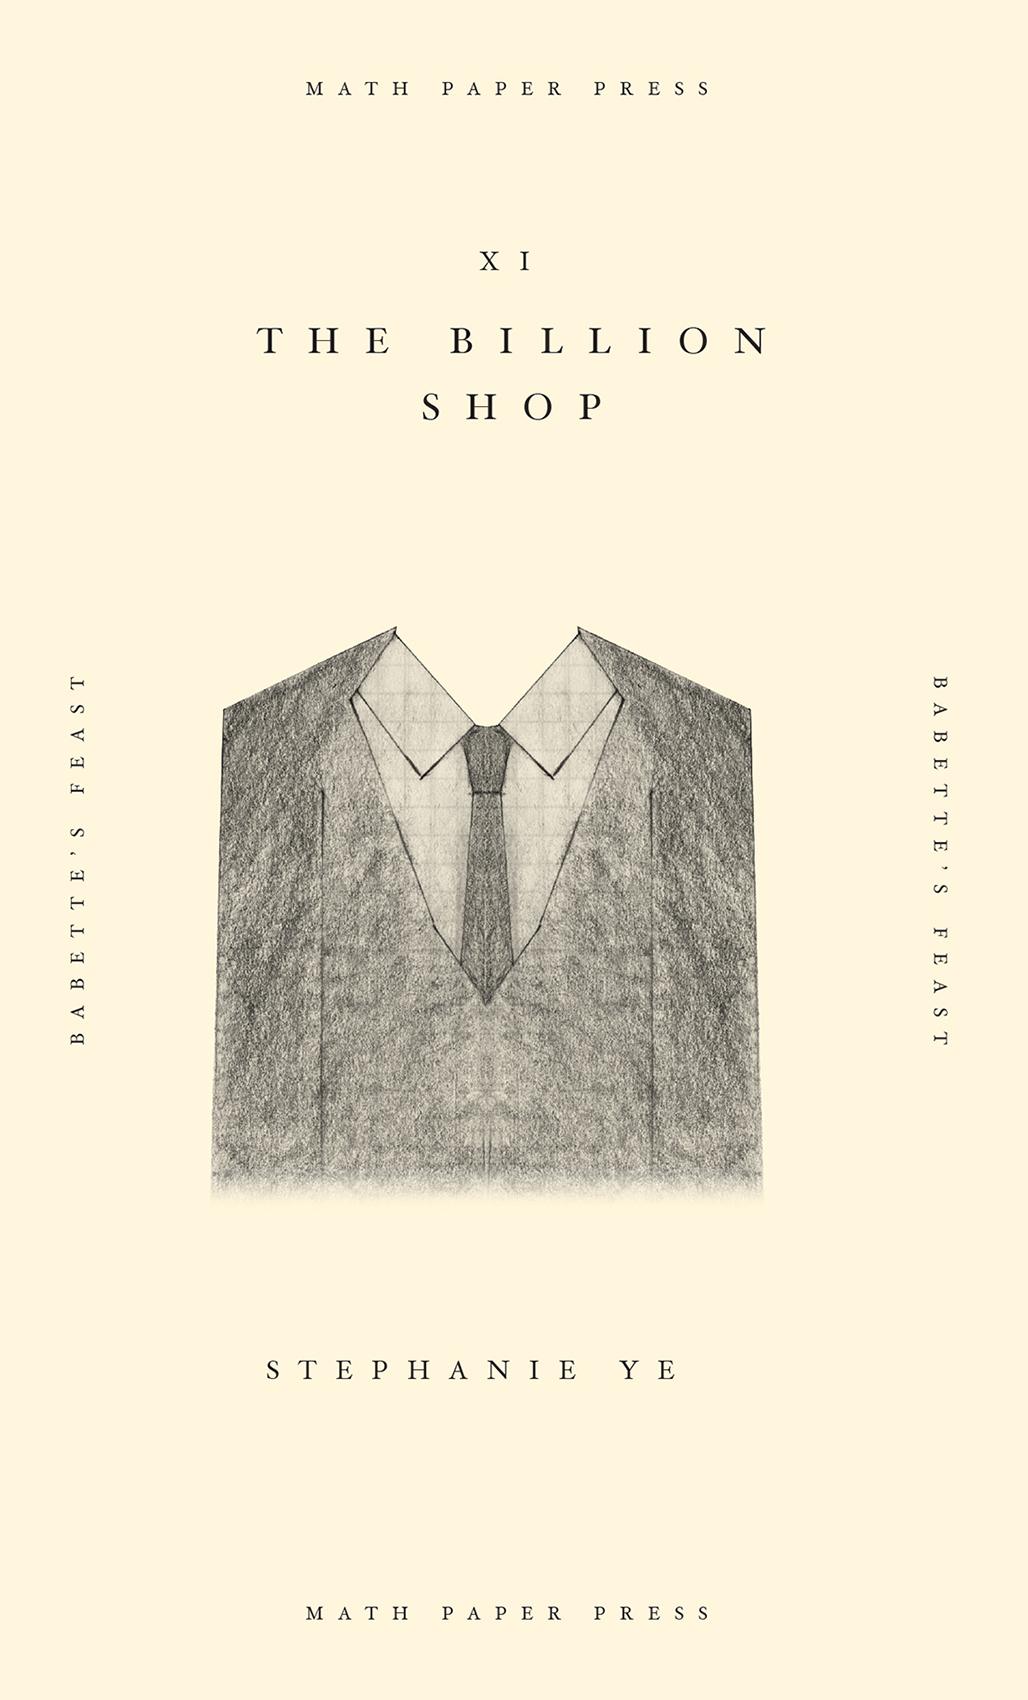 The Billion Shop Stephanie Ye